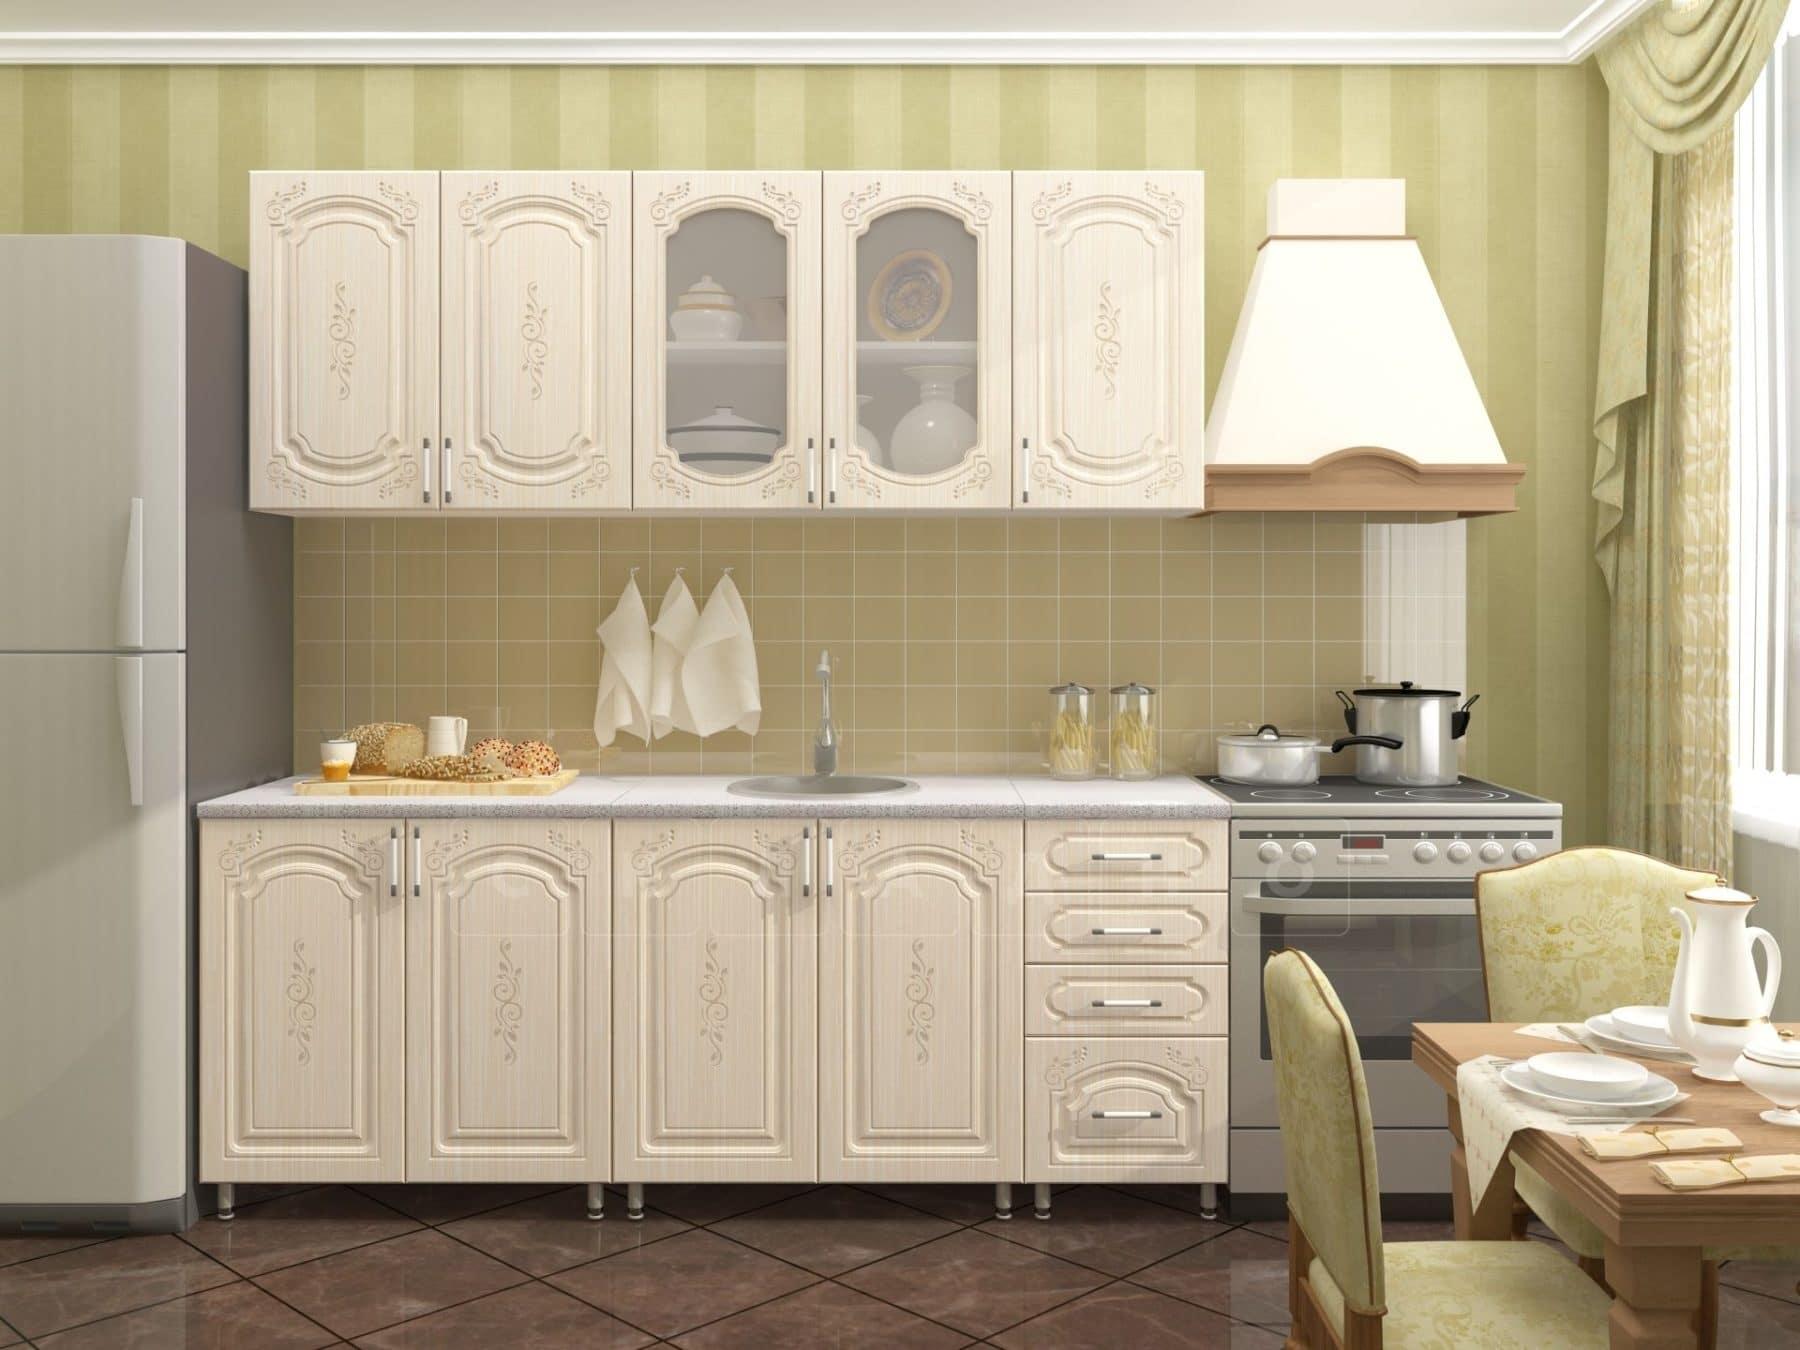 Кухонный гарнитур Боско 2,0 м фото 1 | интернет-магазин Складно